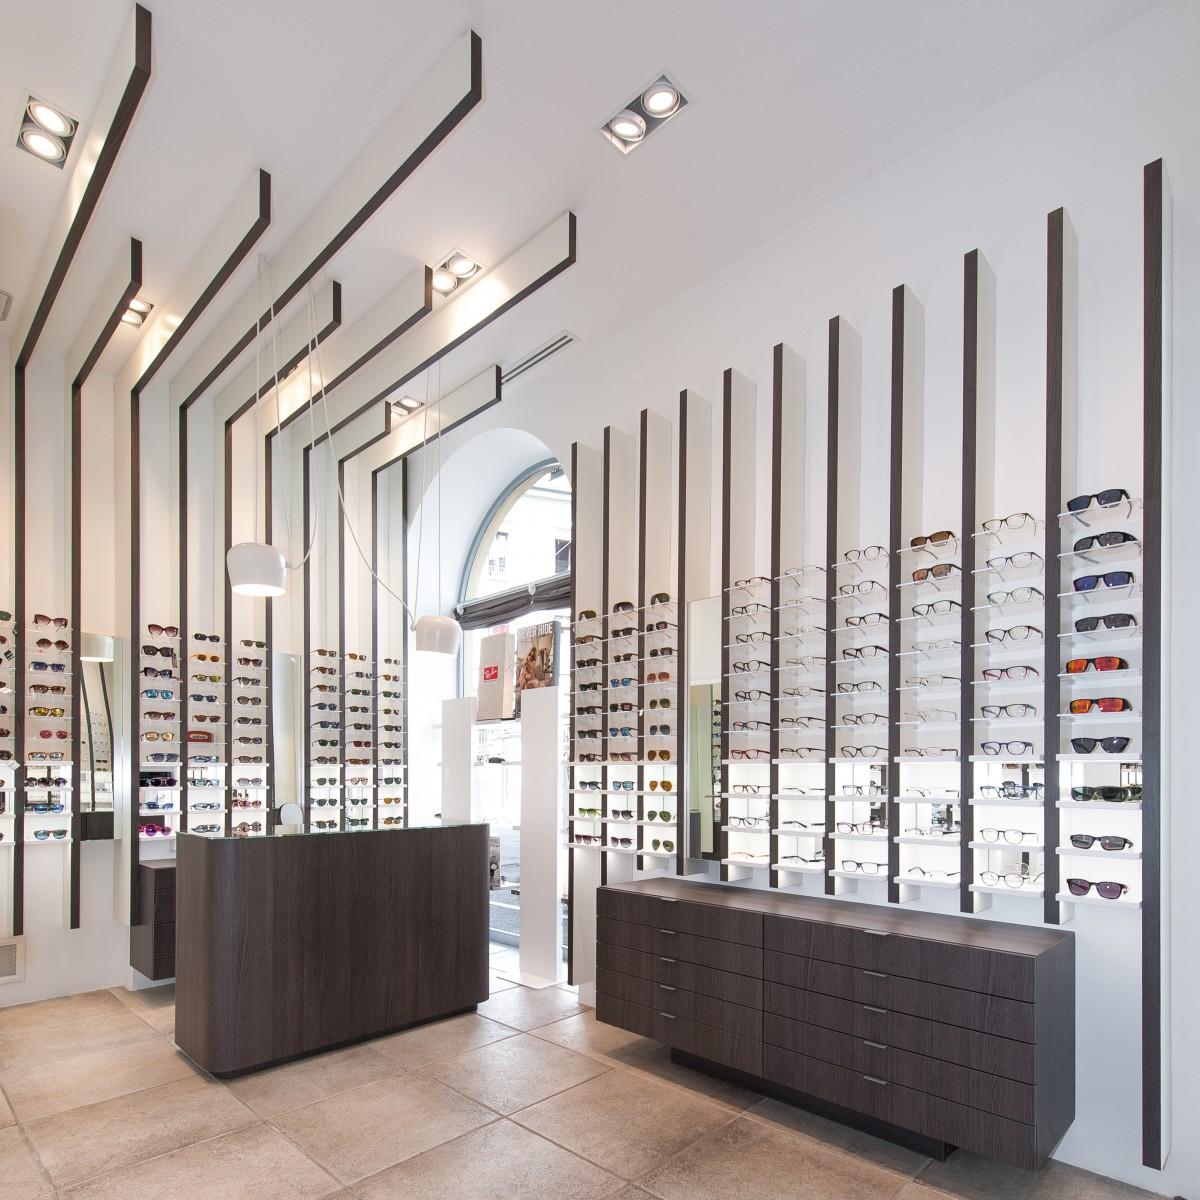 OUYEE wooden acrylic eyewear displays for wholesale for shop-5